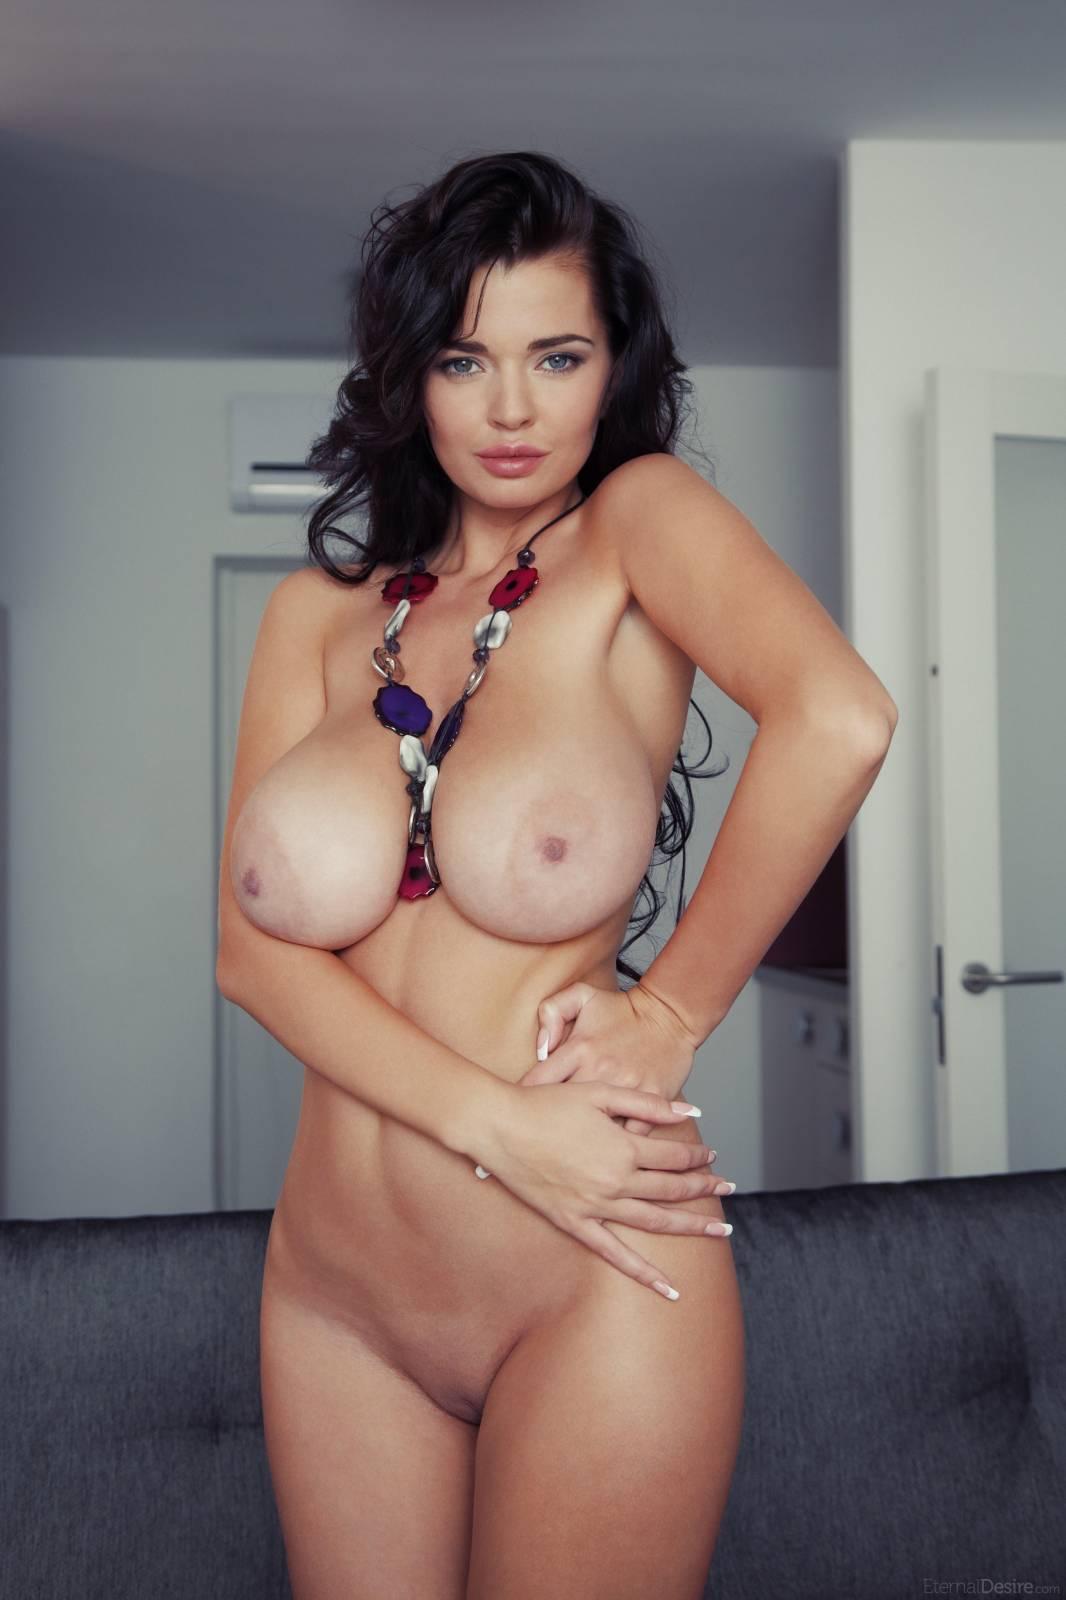 Сисе порно актриса 12 фотография